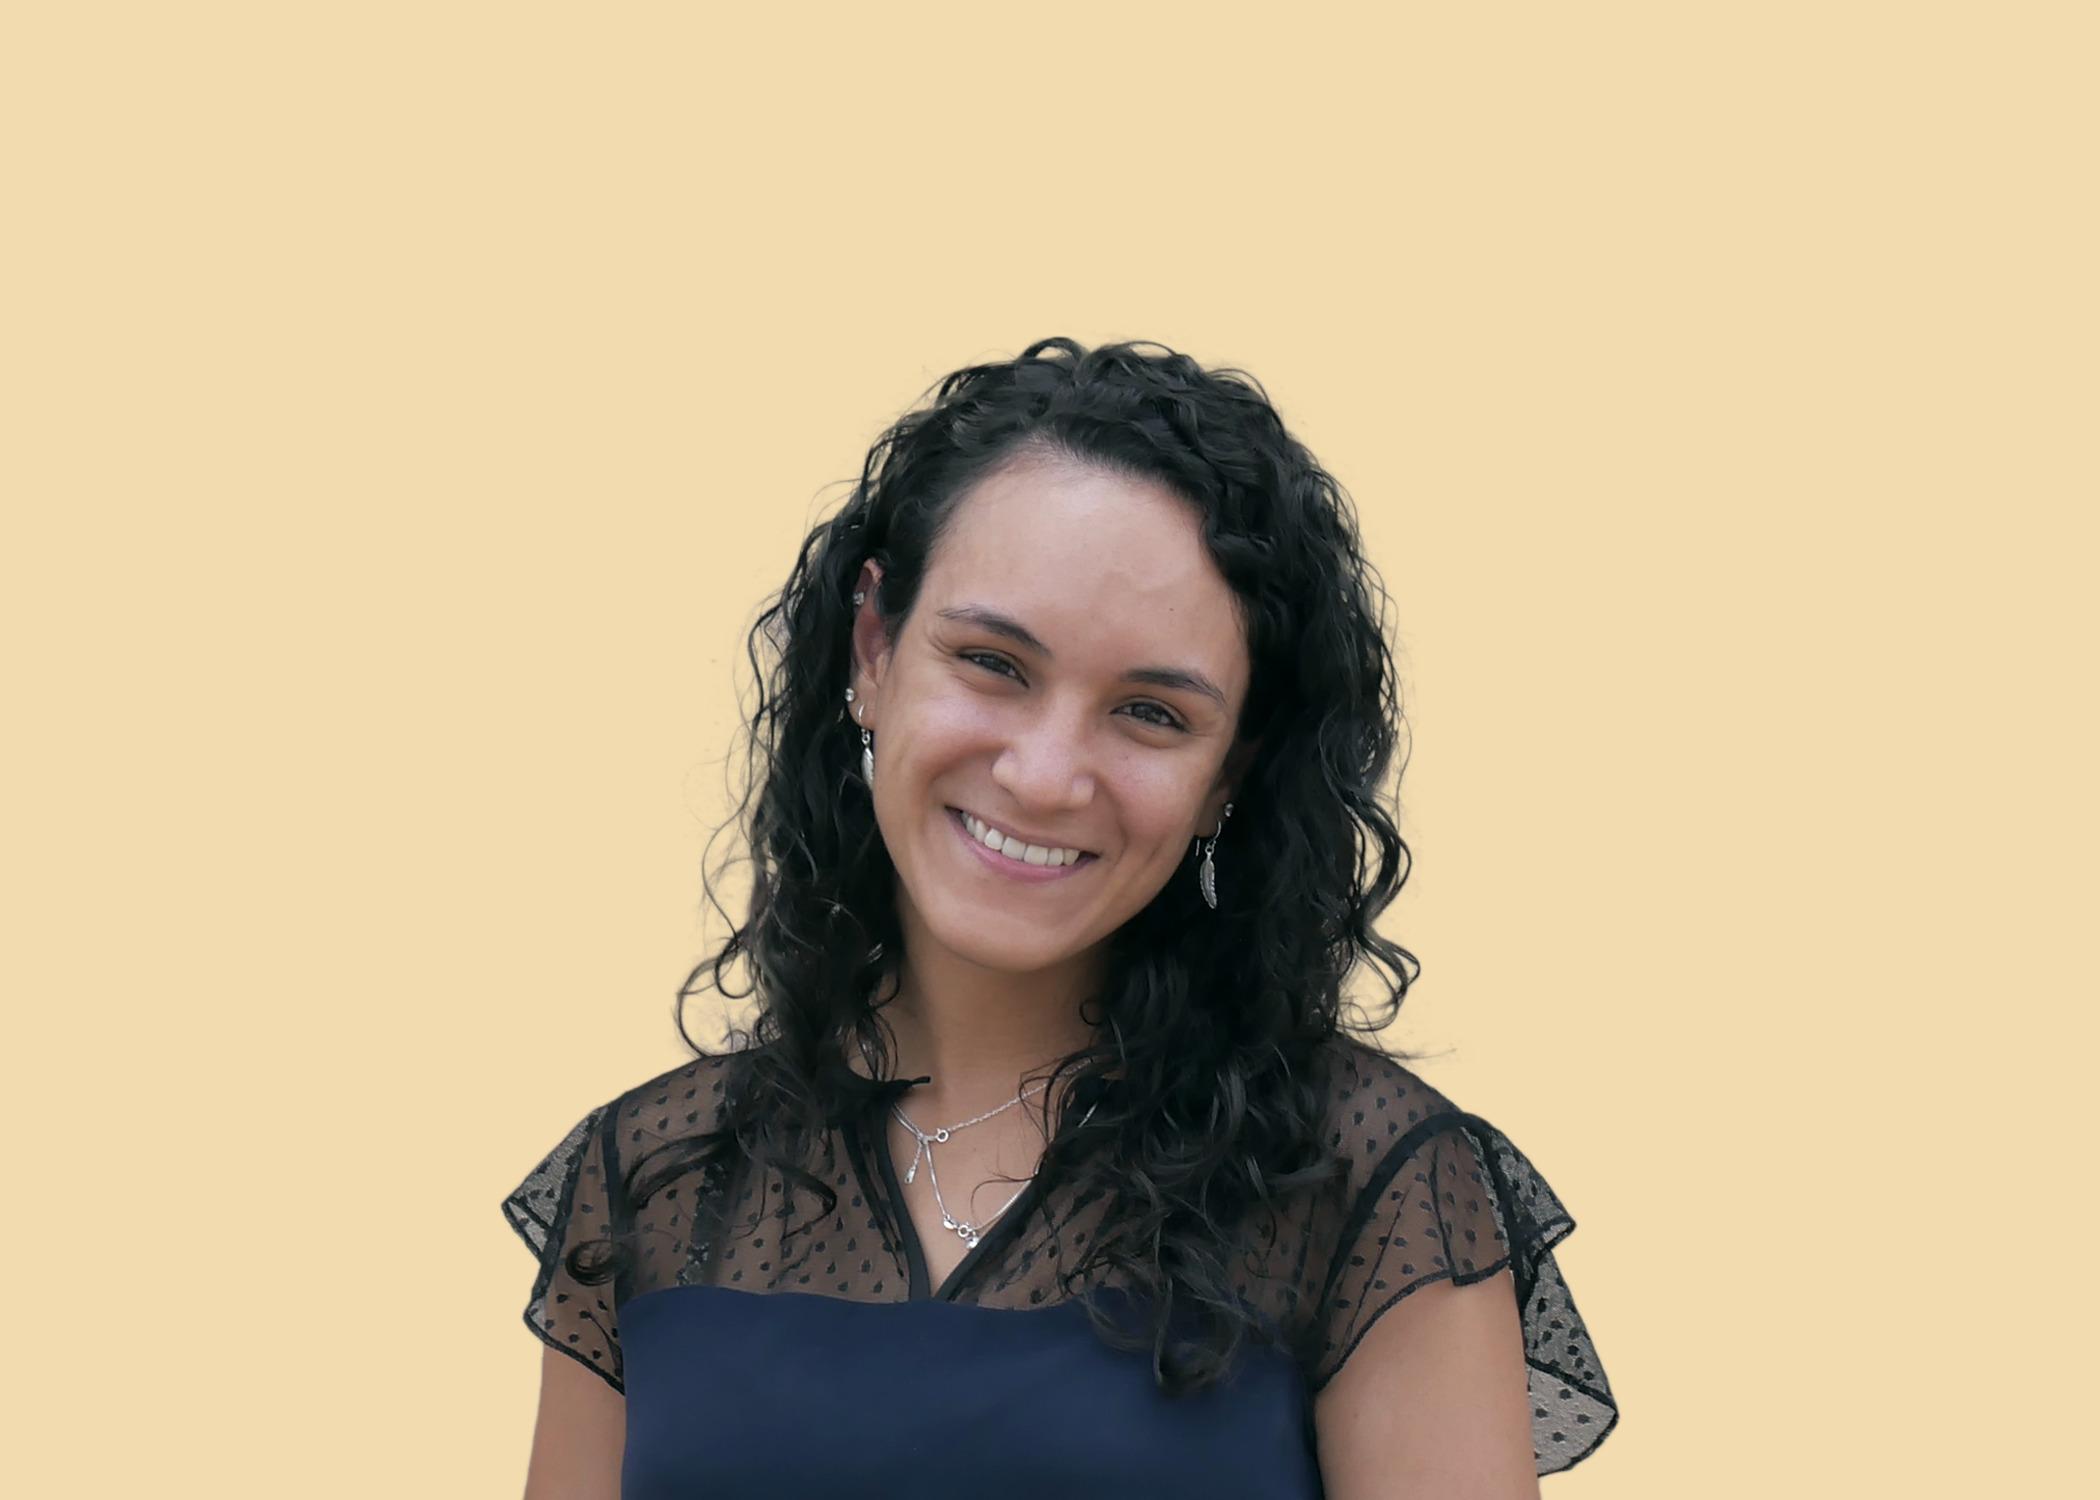 Lorena Machado Gomes